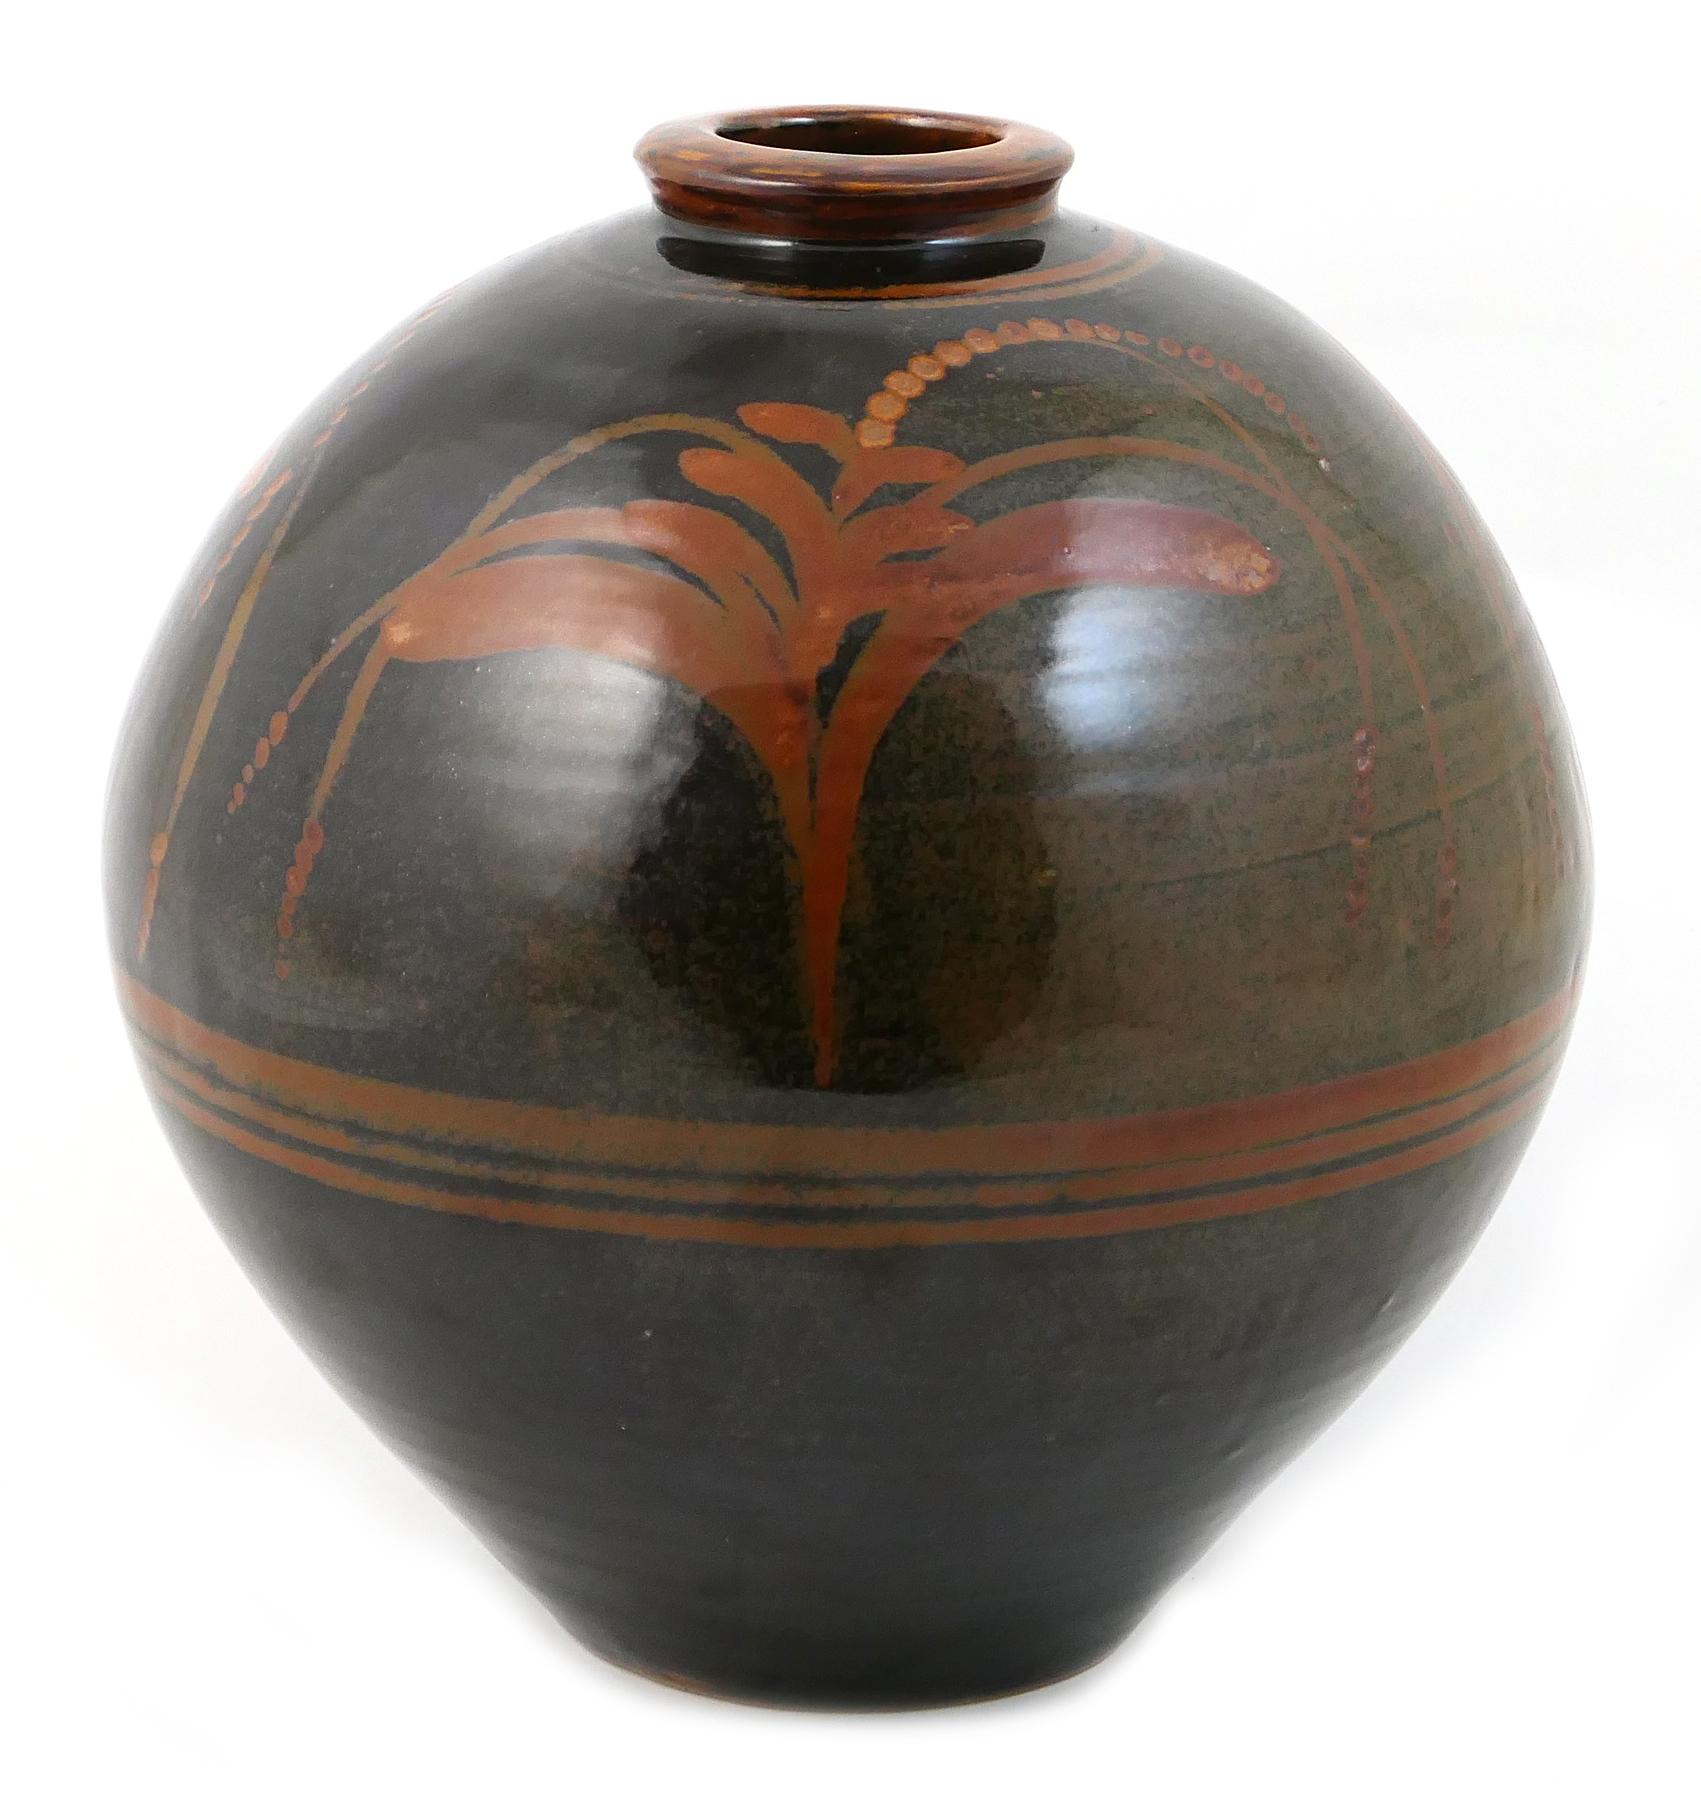 Lot 44 - David Leach (1911-2005), large stoneware globular jar, decorated throughout in a tamaku glaze